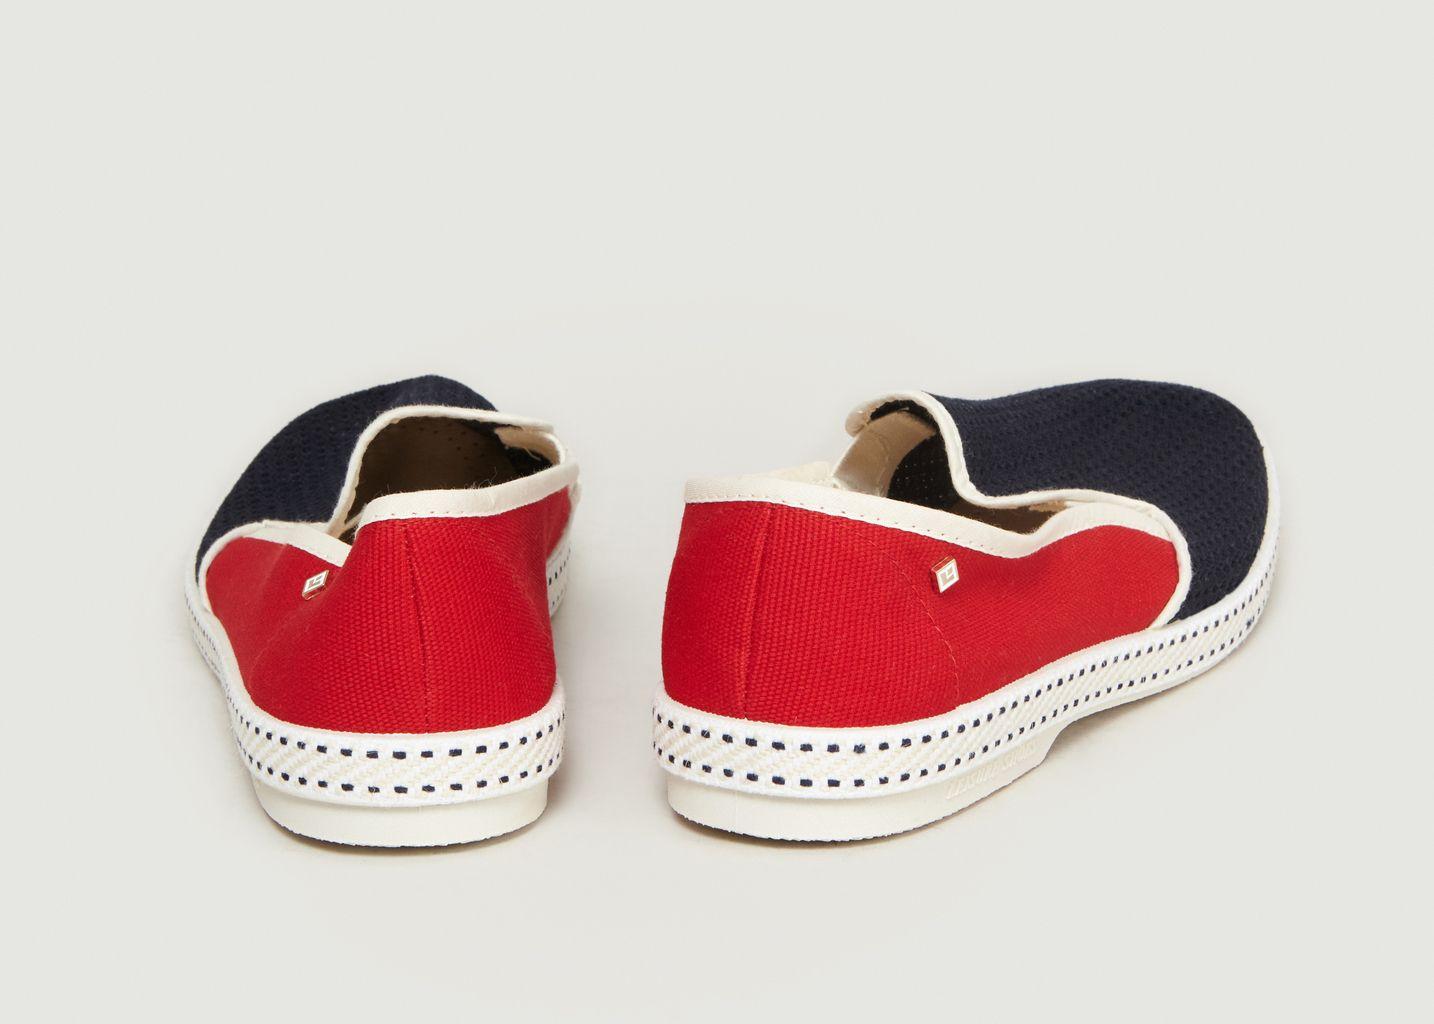 Chaussures France en Toile - Rivieras